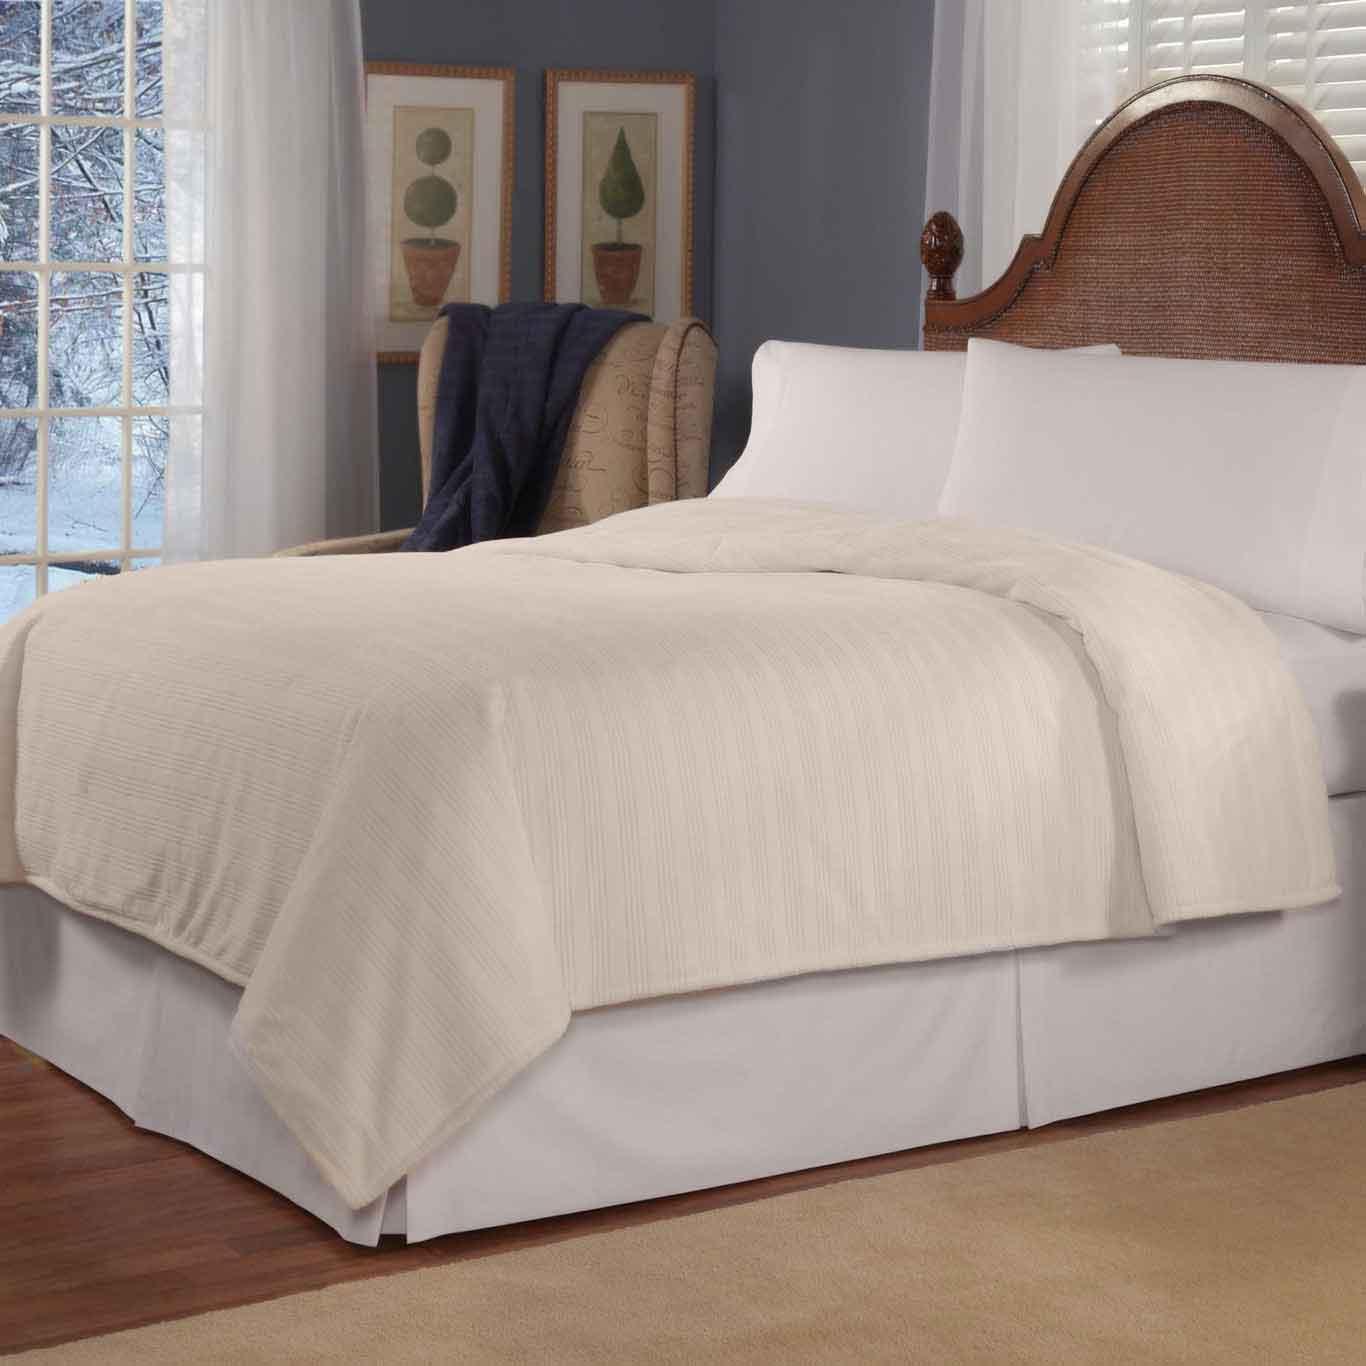 Soft Heat Micro-plush Tri-stripe Low Voltage Electric Blanket, Twin, Natural